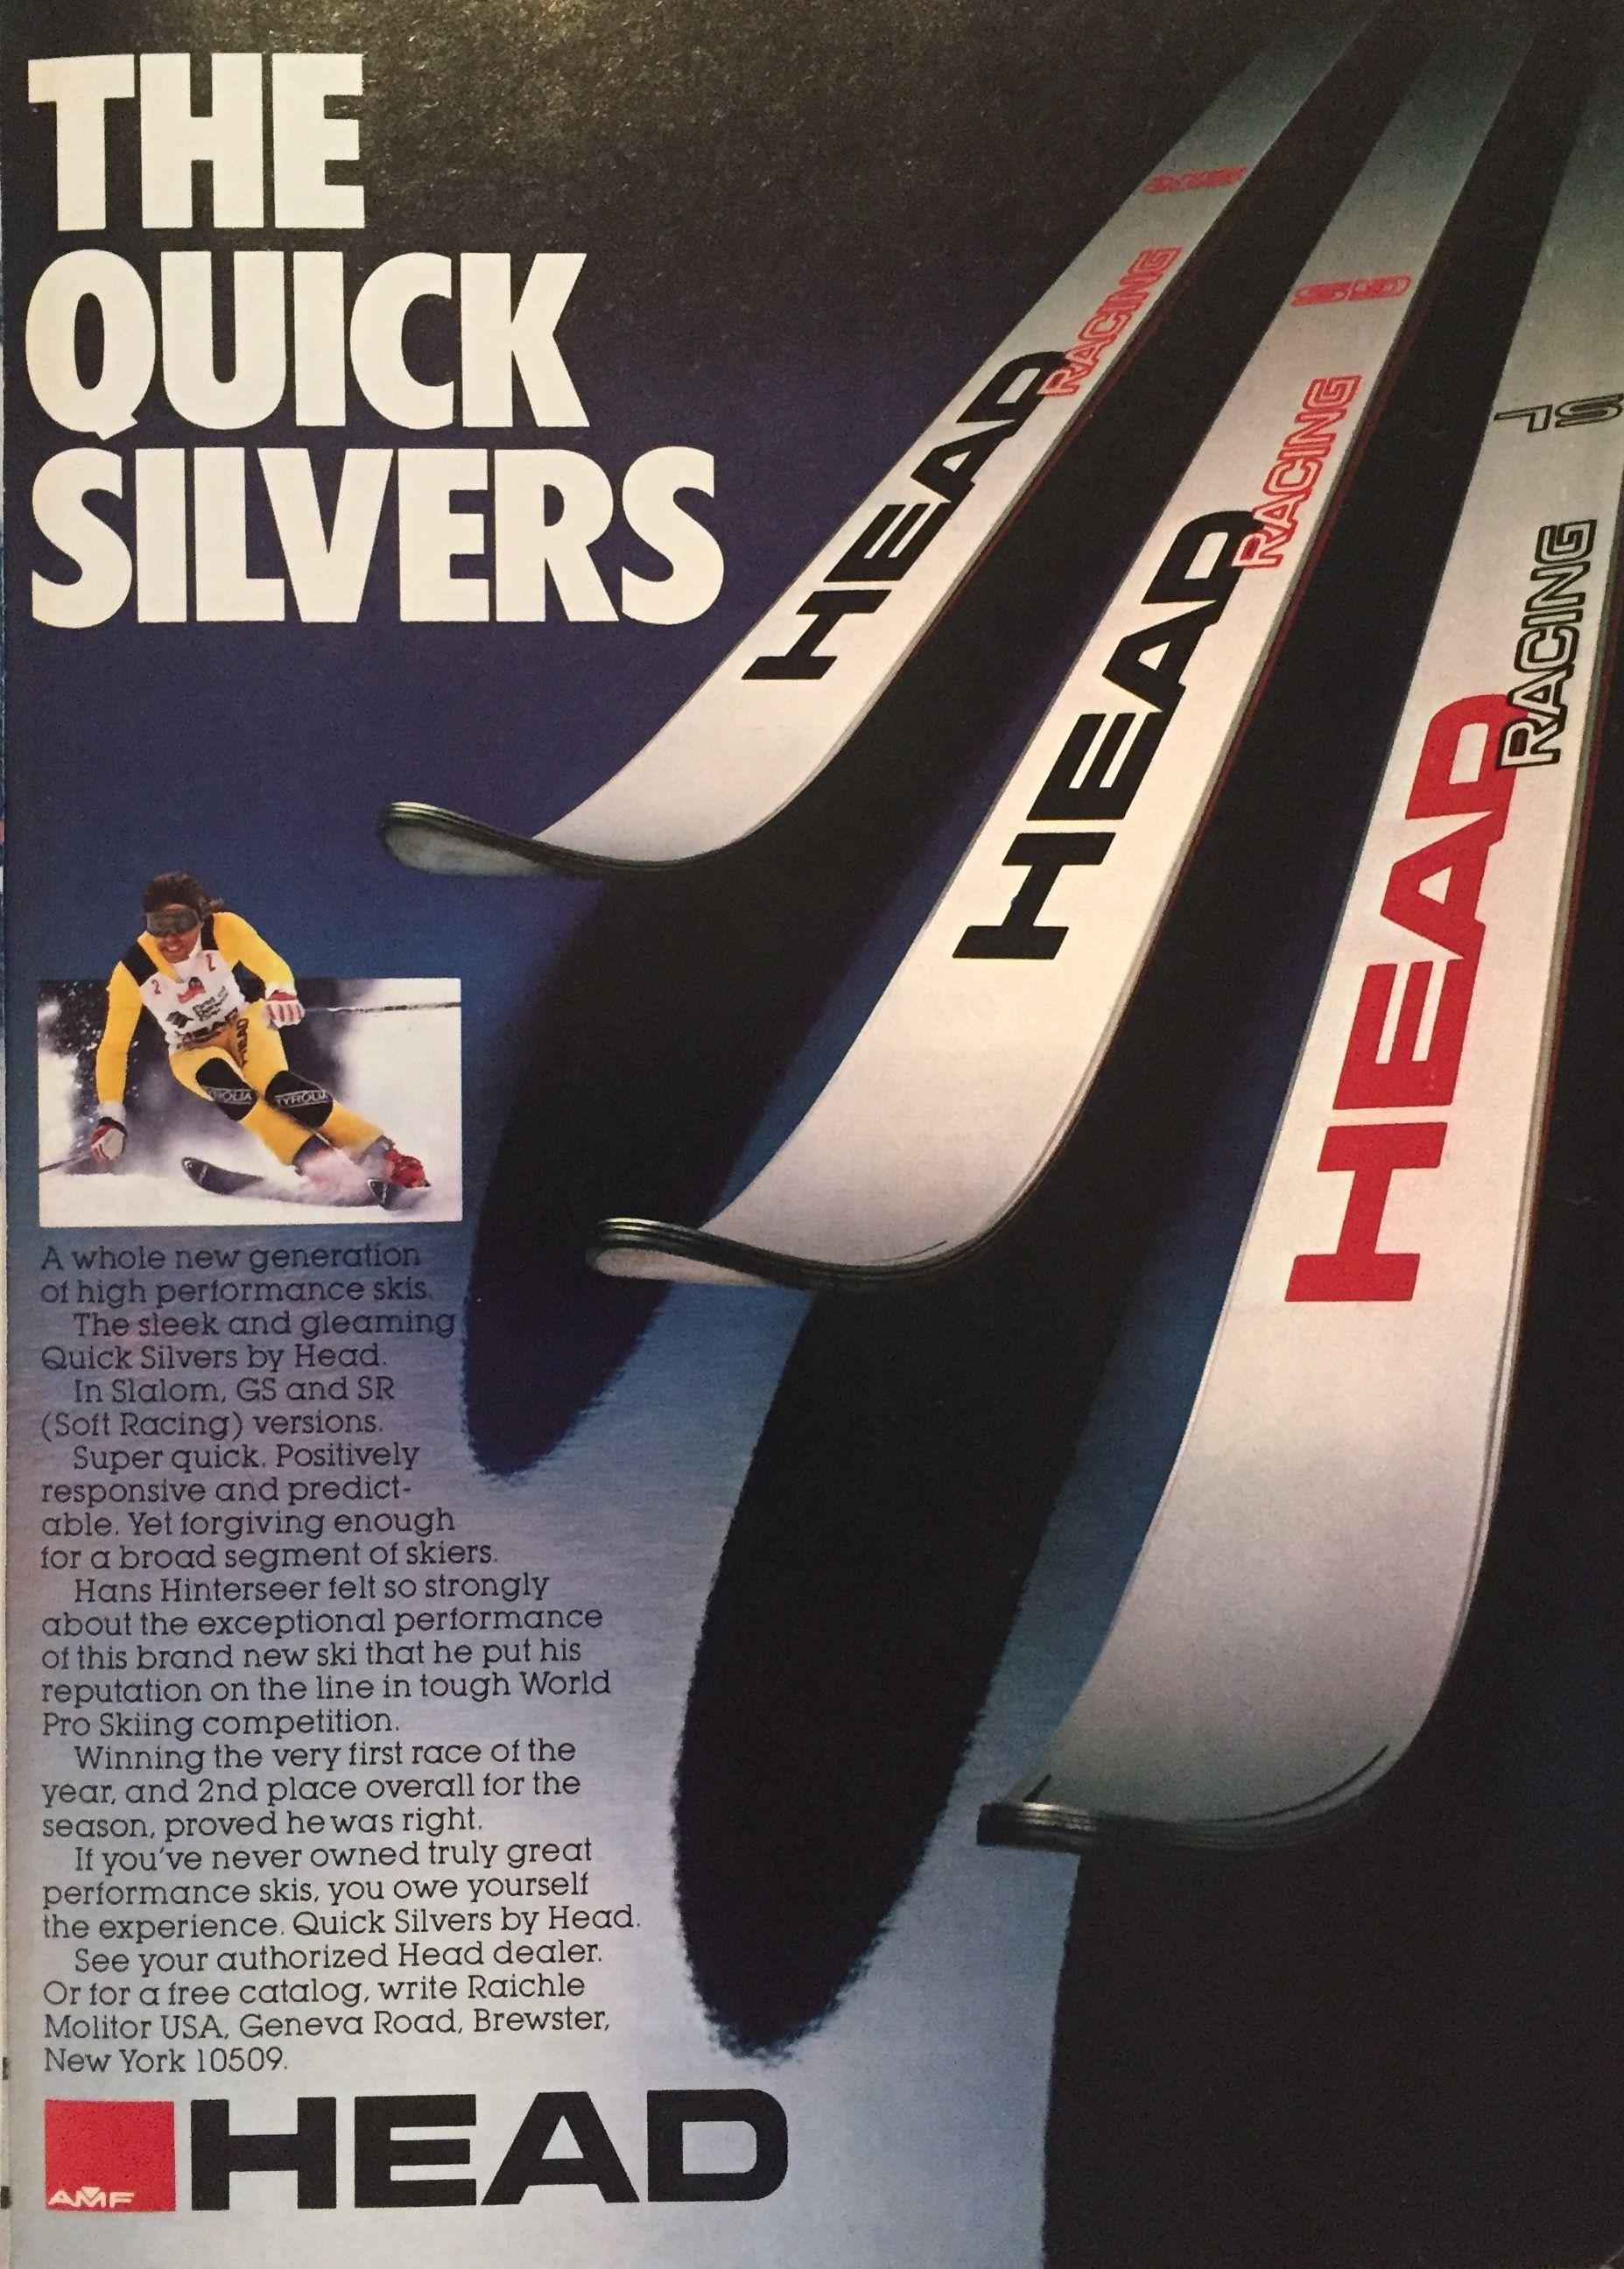 Pin Von Daniel Darrigrande Auf Ski Skifahren Fahren Nostalgie